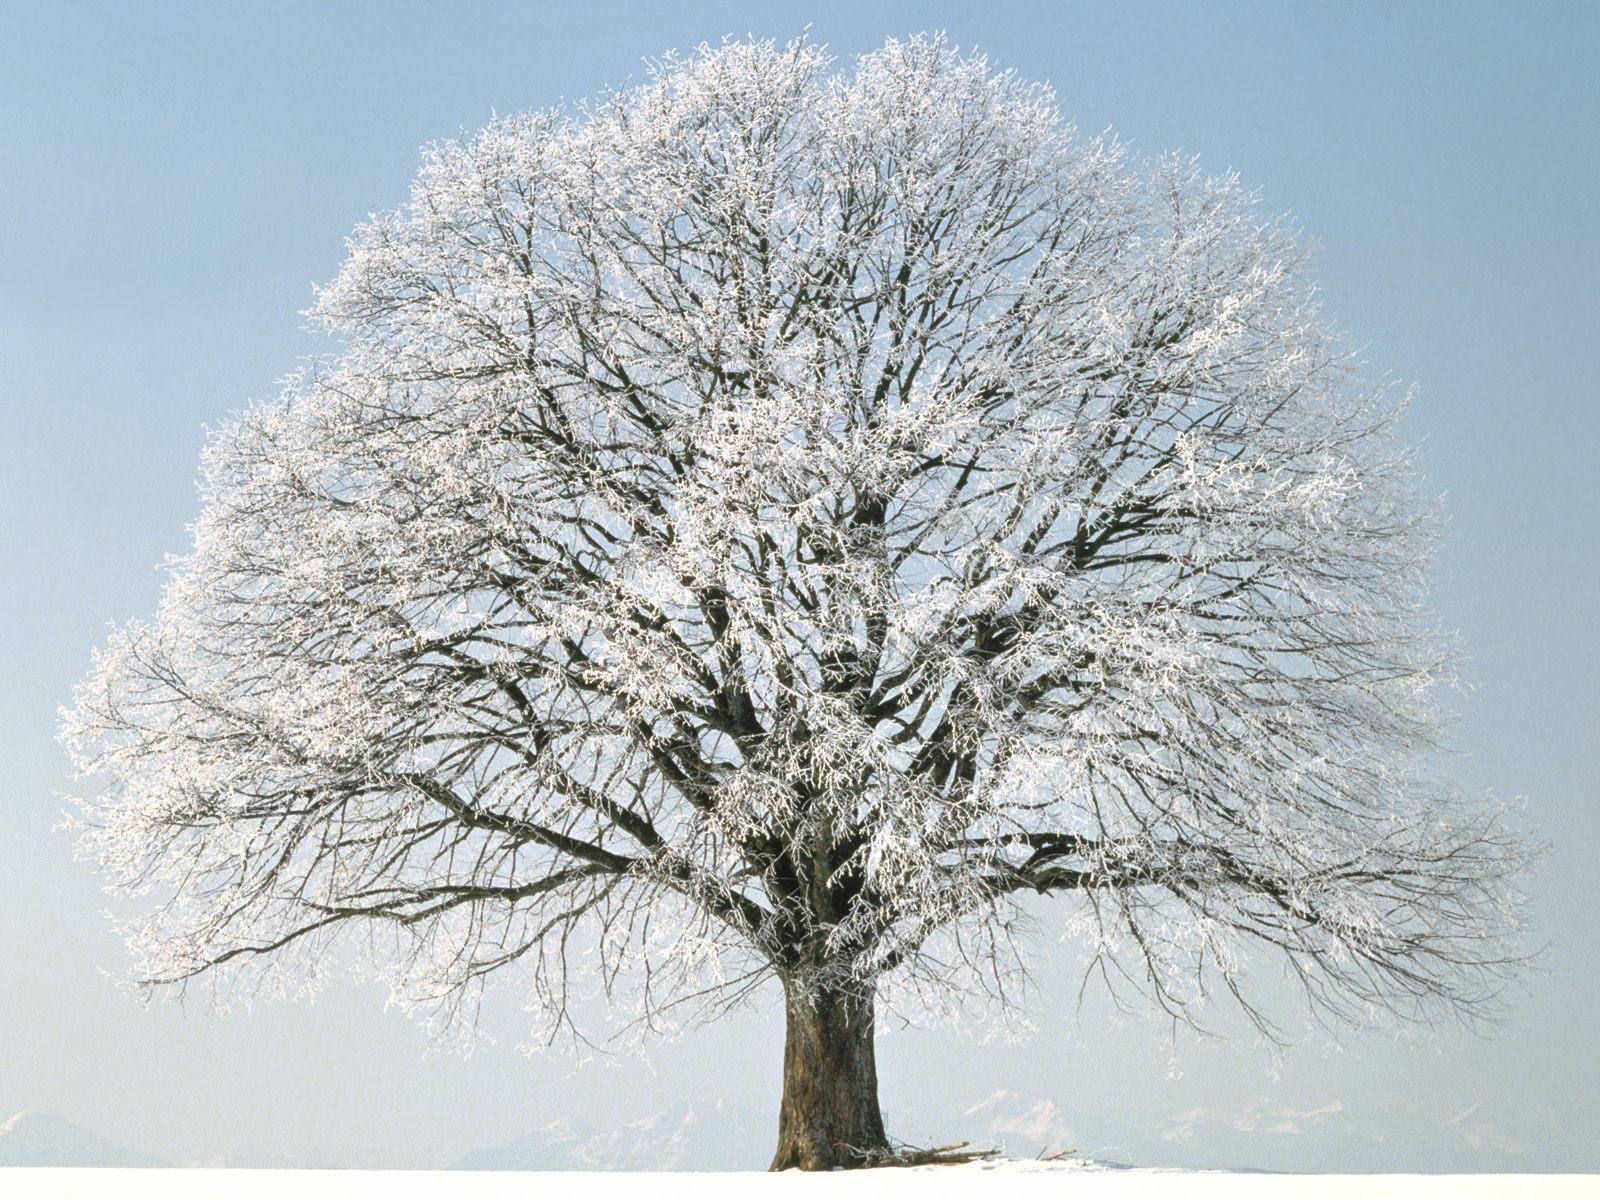 http://1.bp.blogspot.com/-tdCW4V1CnWM/TamPXoplC_I/AAAAAAAACqY/AV45AvZTsF0/s1600/winter+scenes+1+%25288%2529.jpg